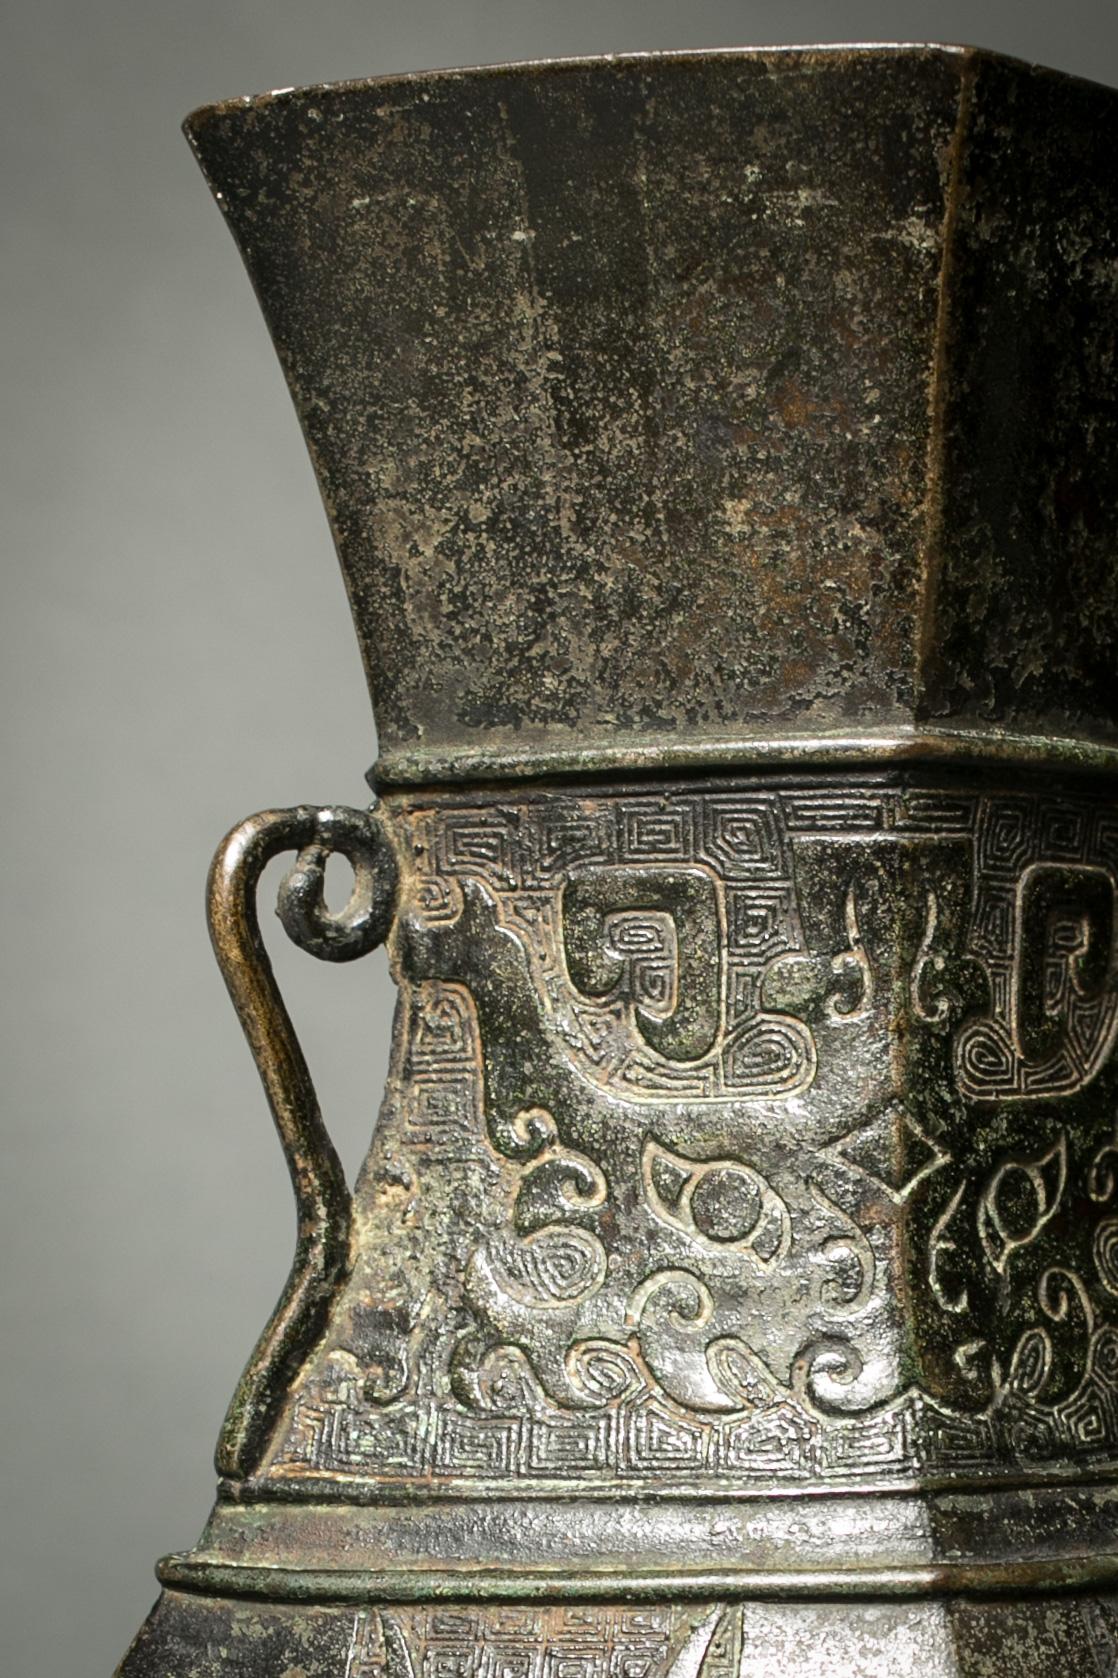 Japanese Antique Bronze Vase With Archaic Design